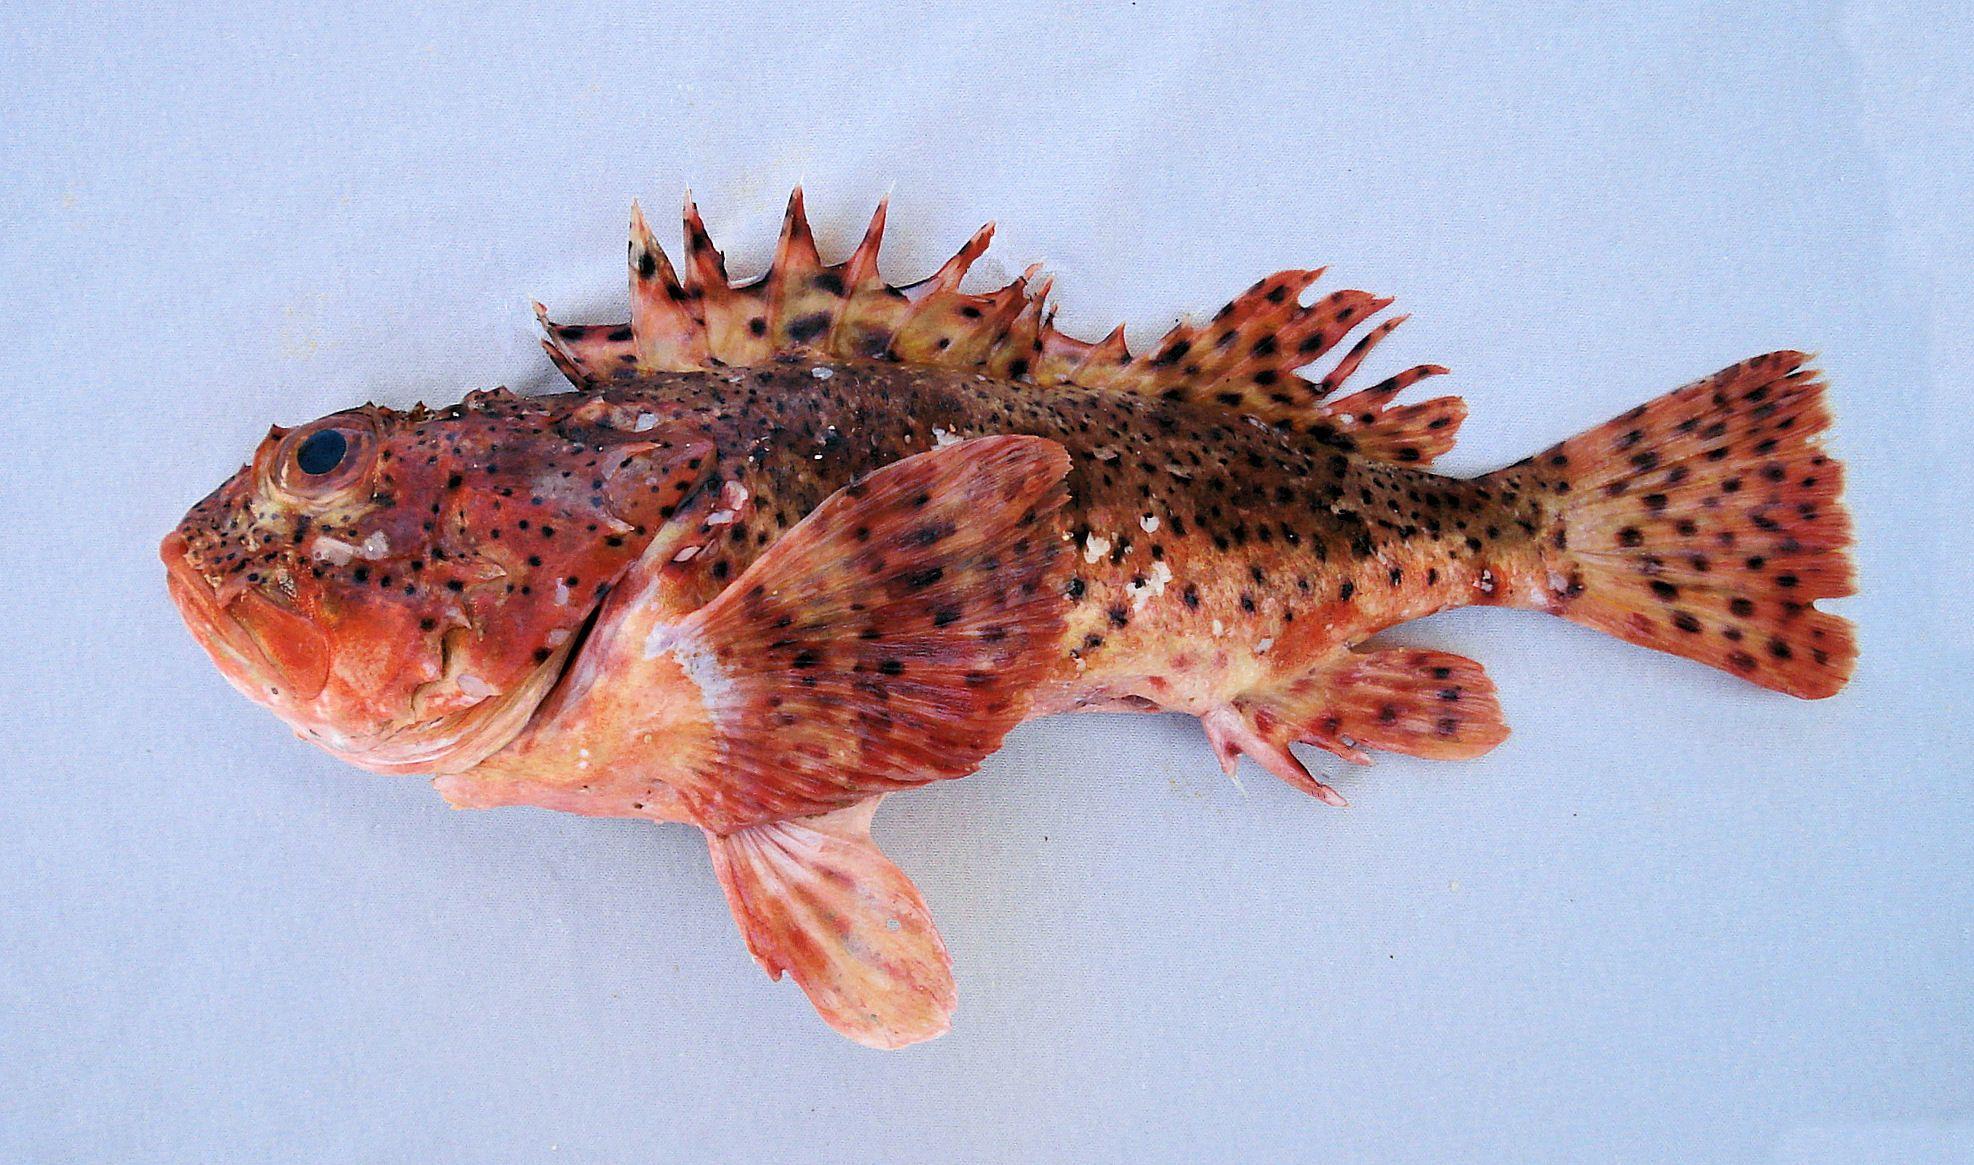 Scorpion Fish Reference Lion Fish Angler Fish Scorpion Fish